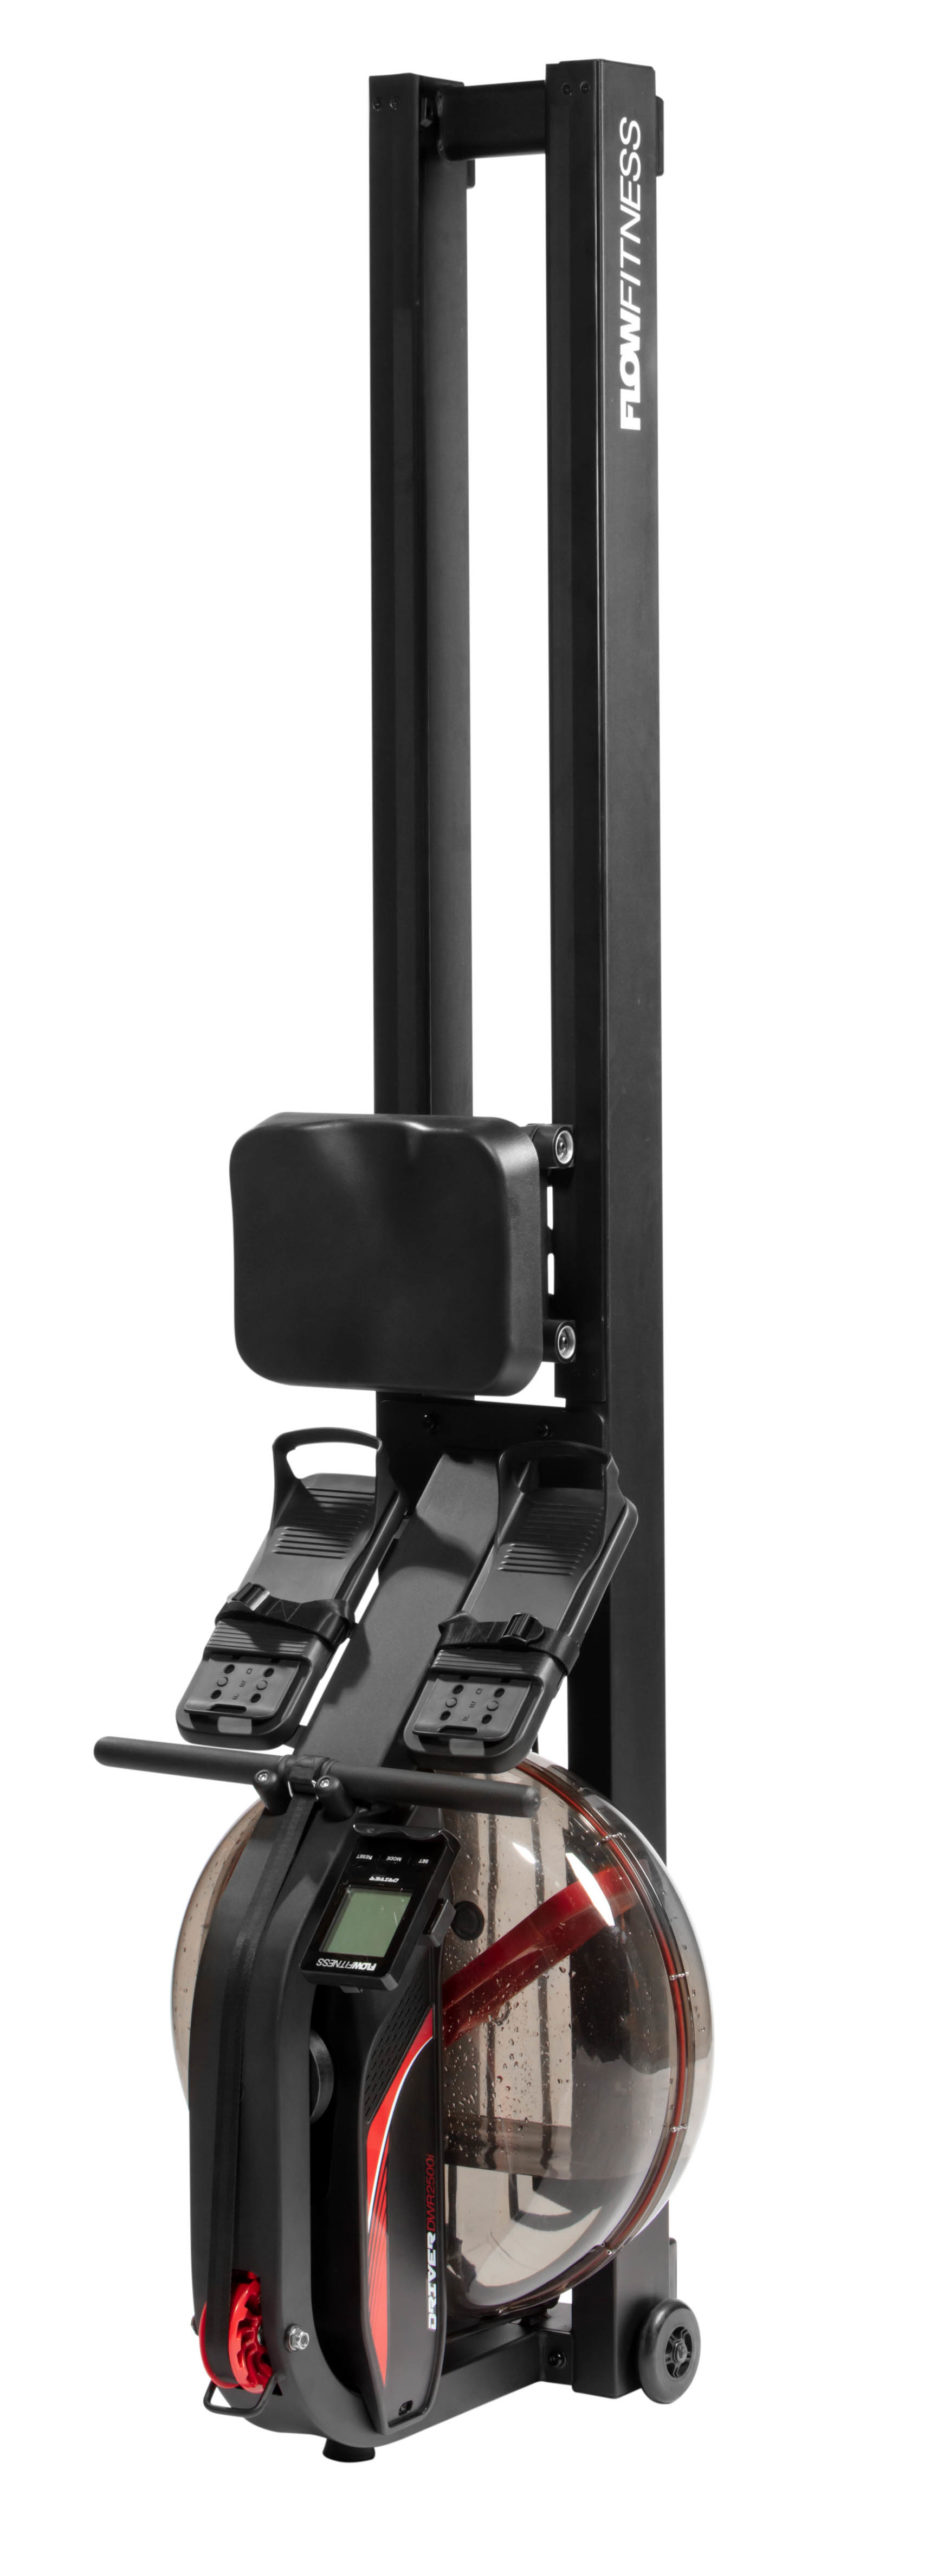 Flow Fitness Tabel Driver DWR2500i 3